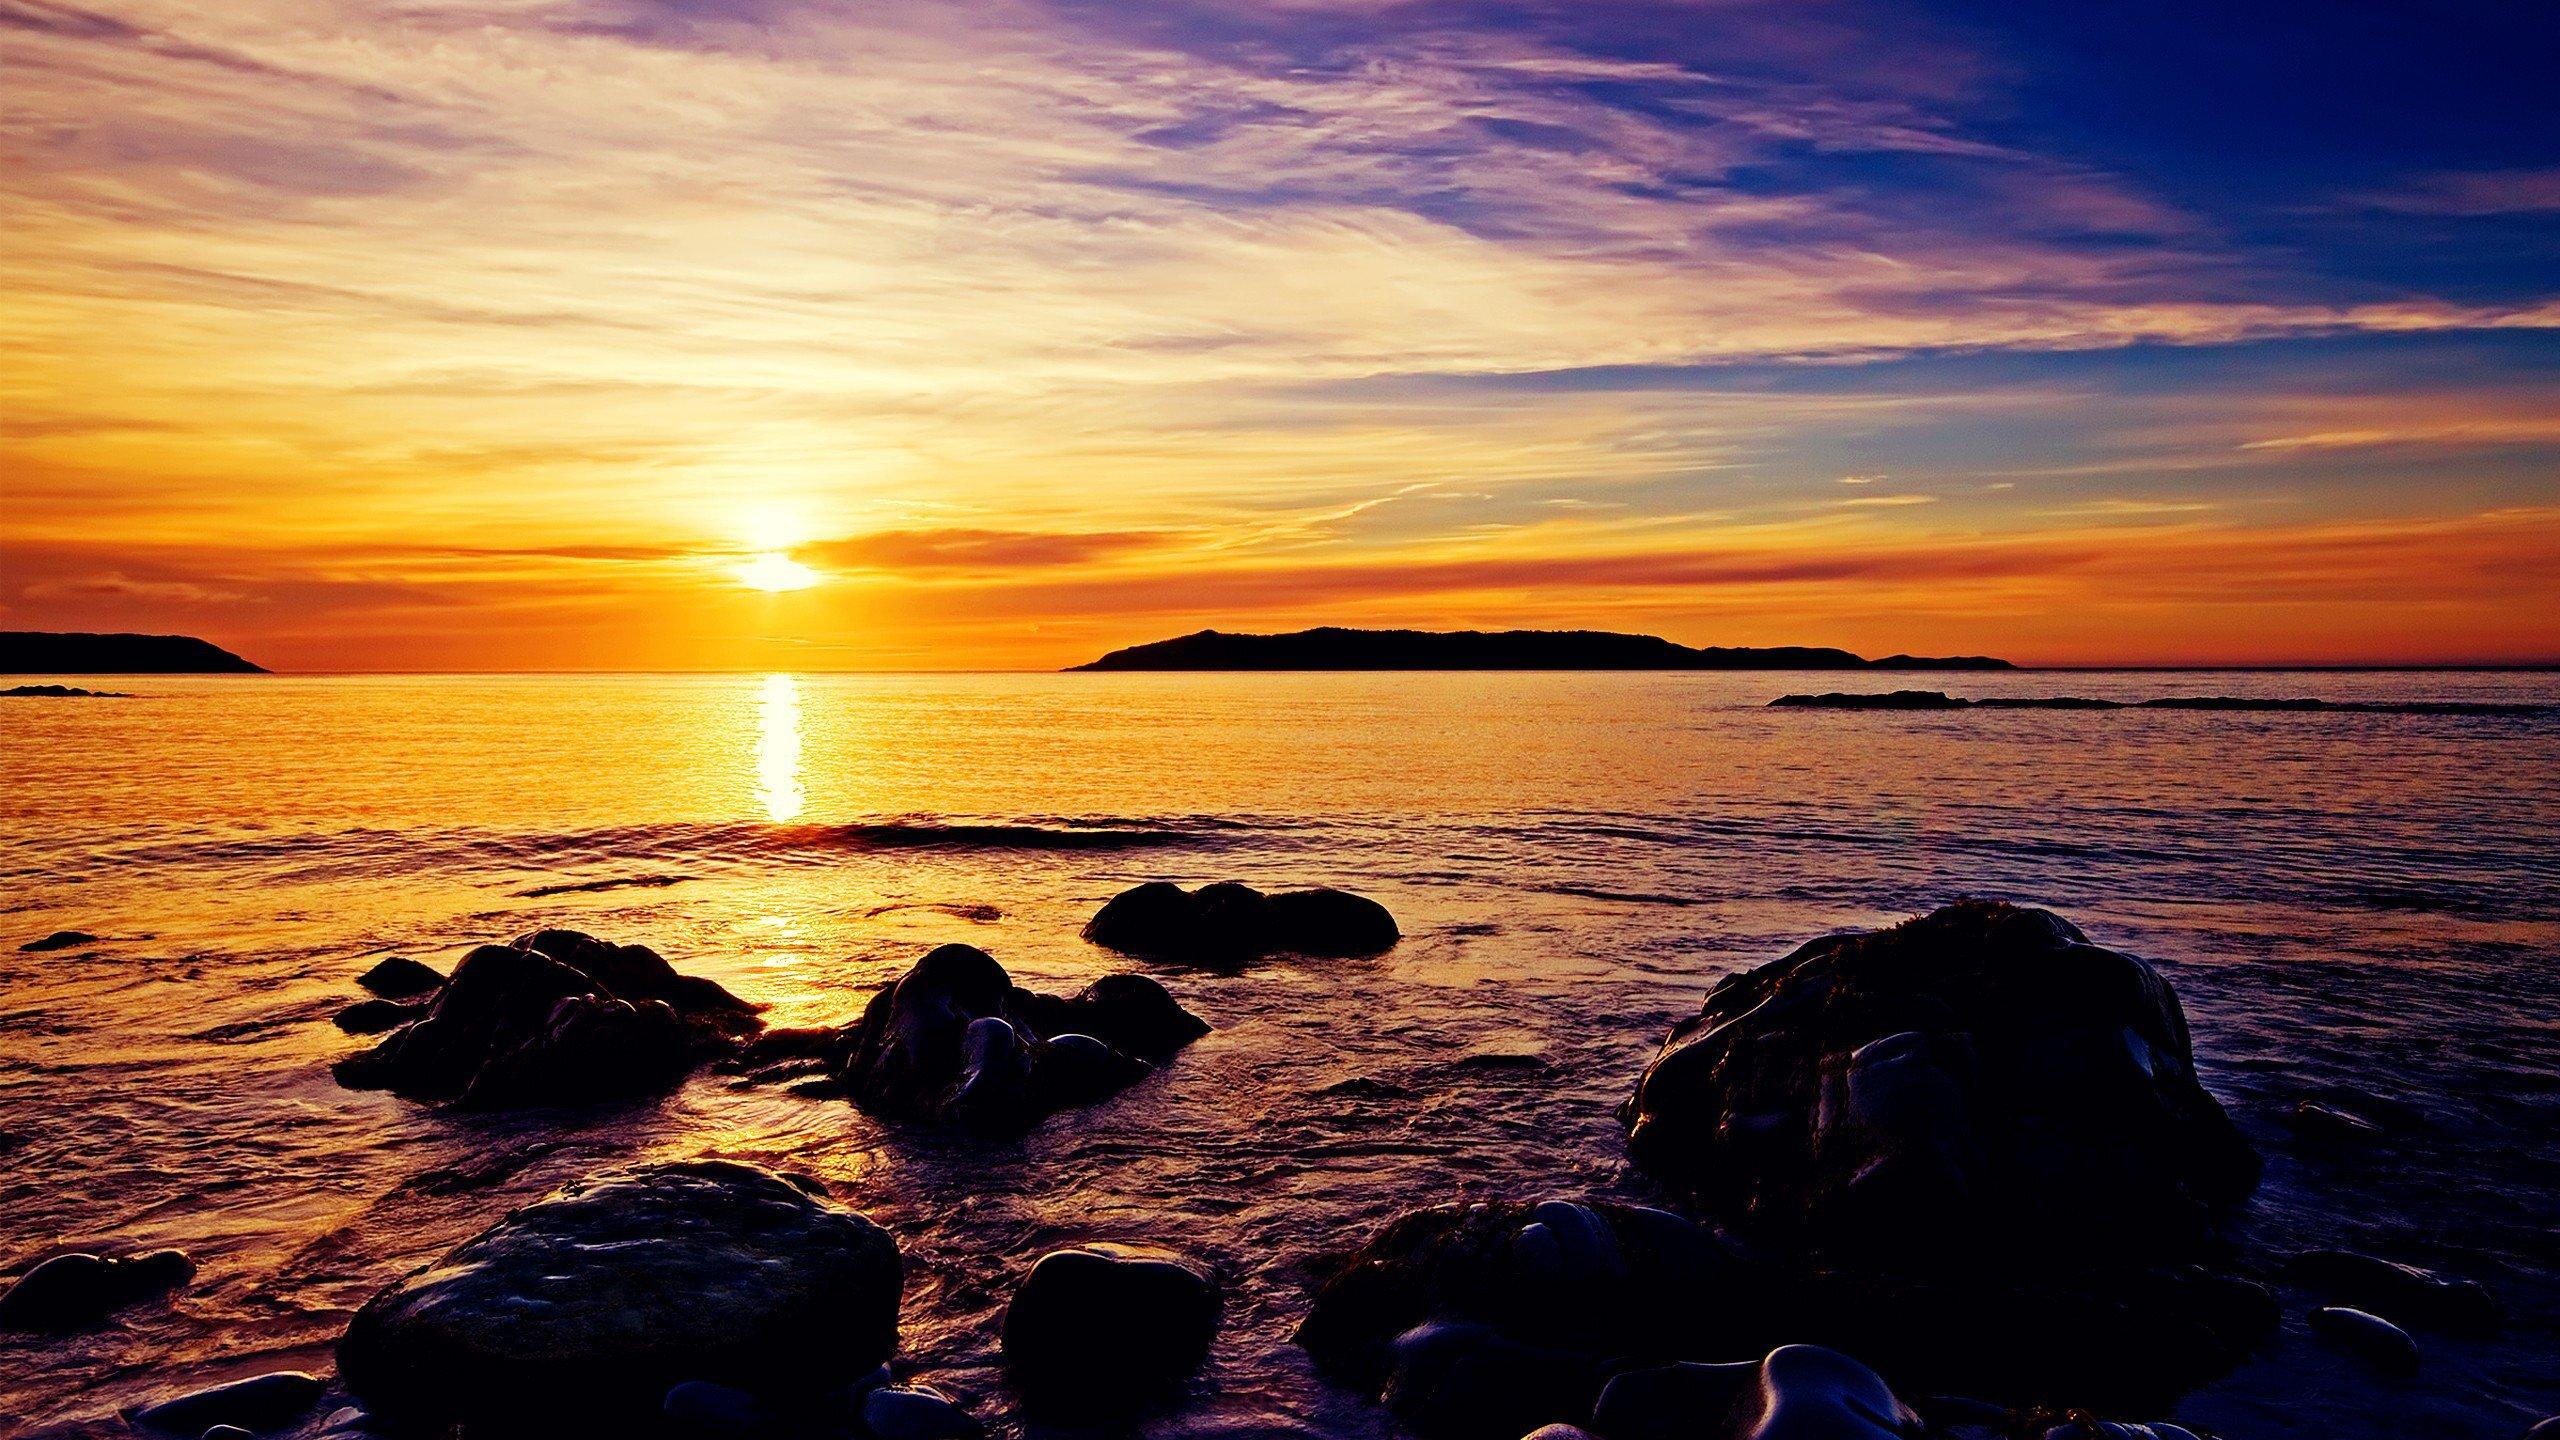 sunrise-beach-hd.jpg